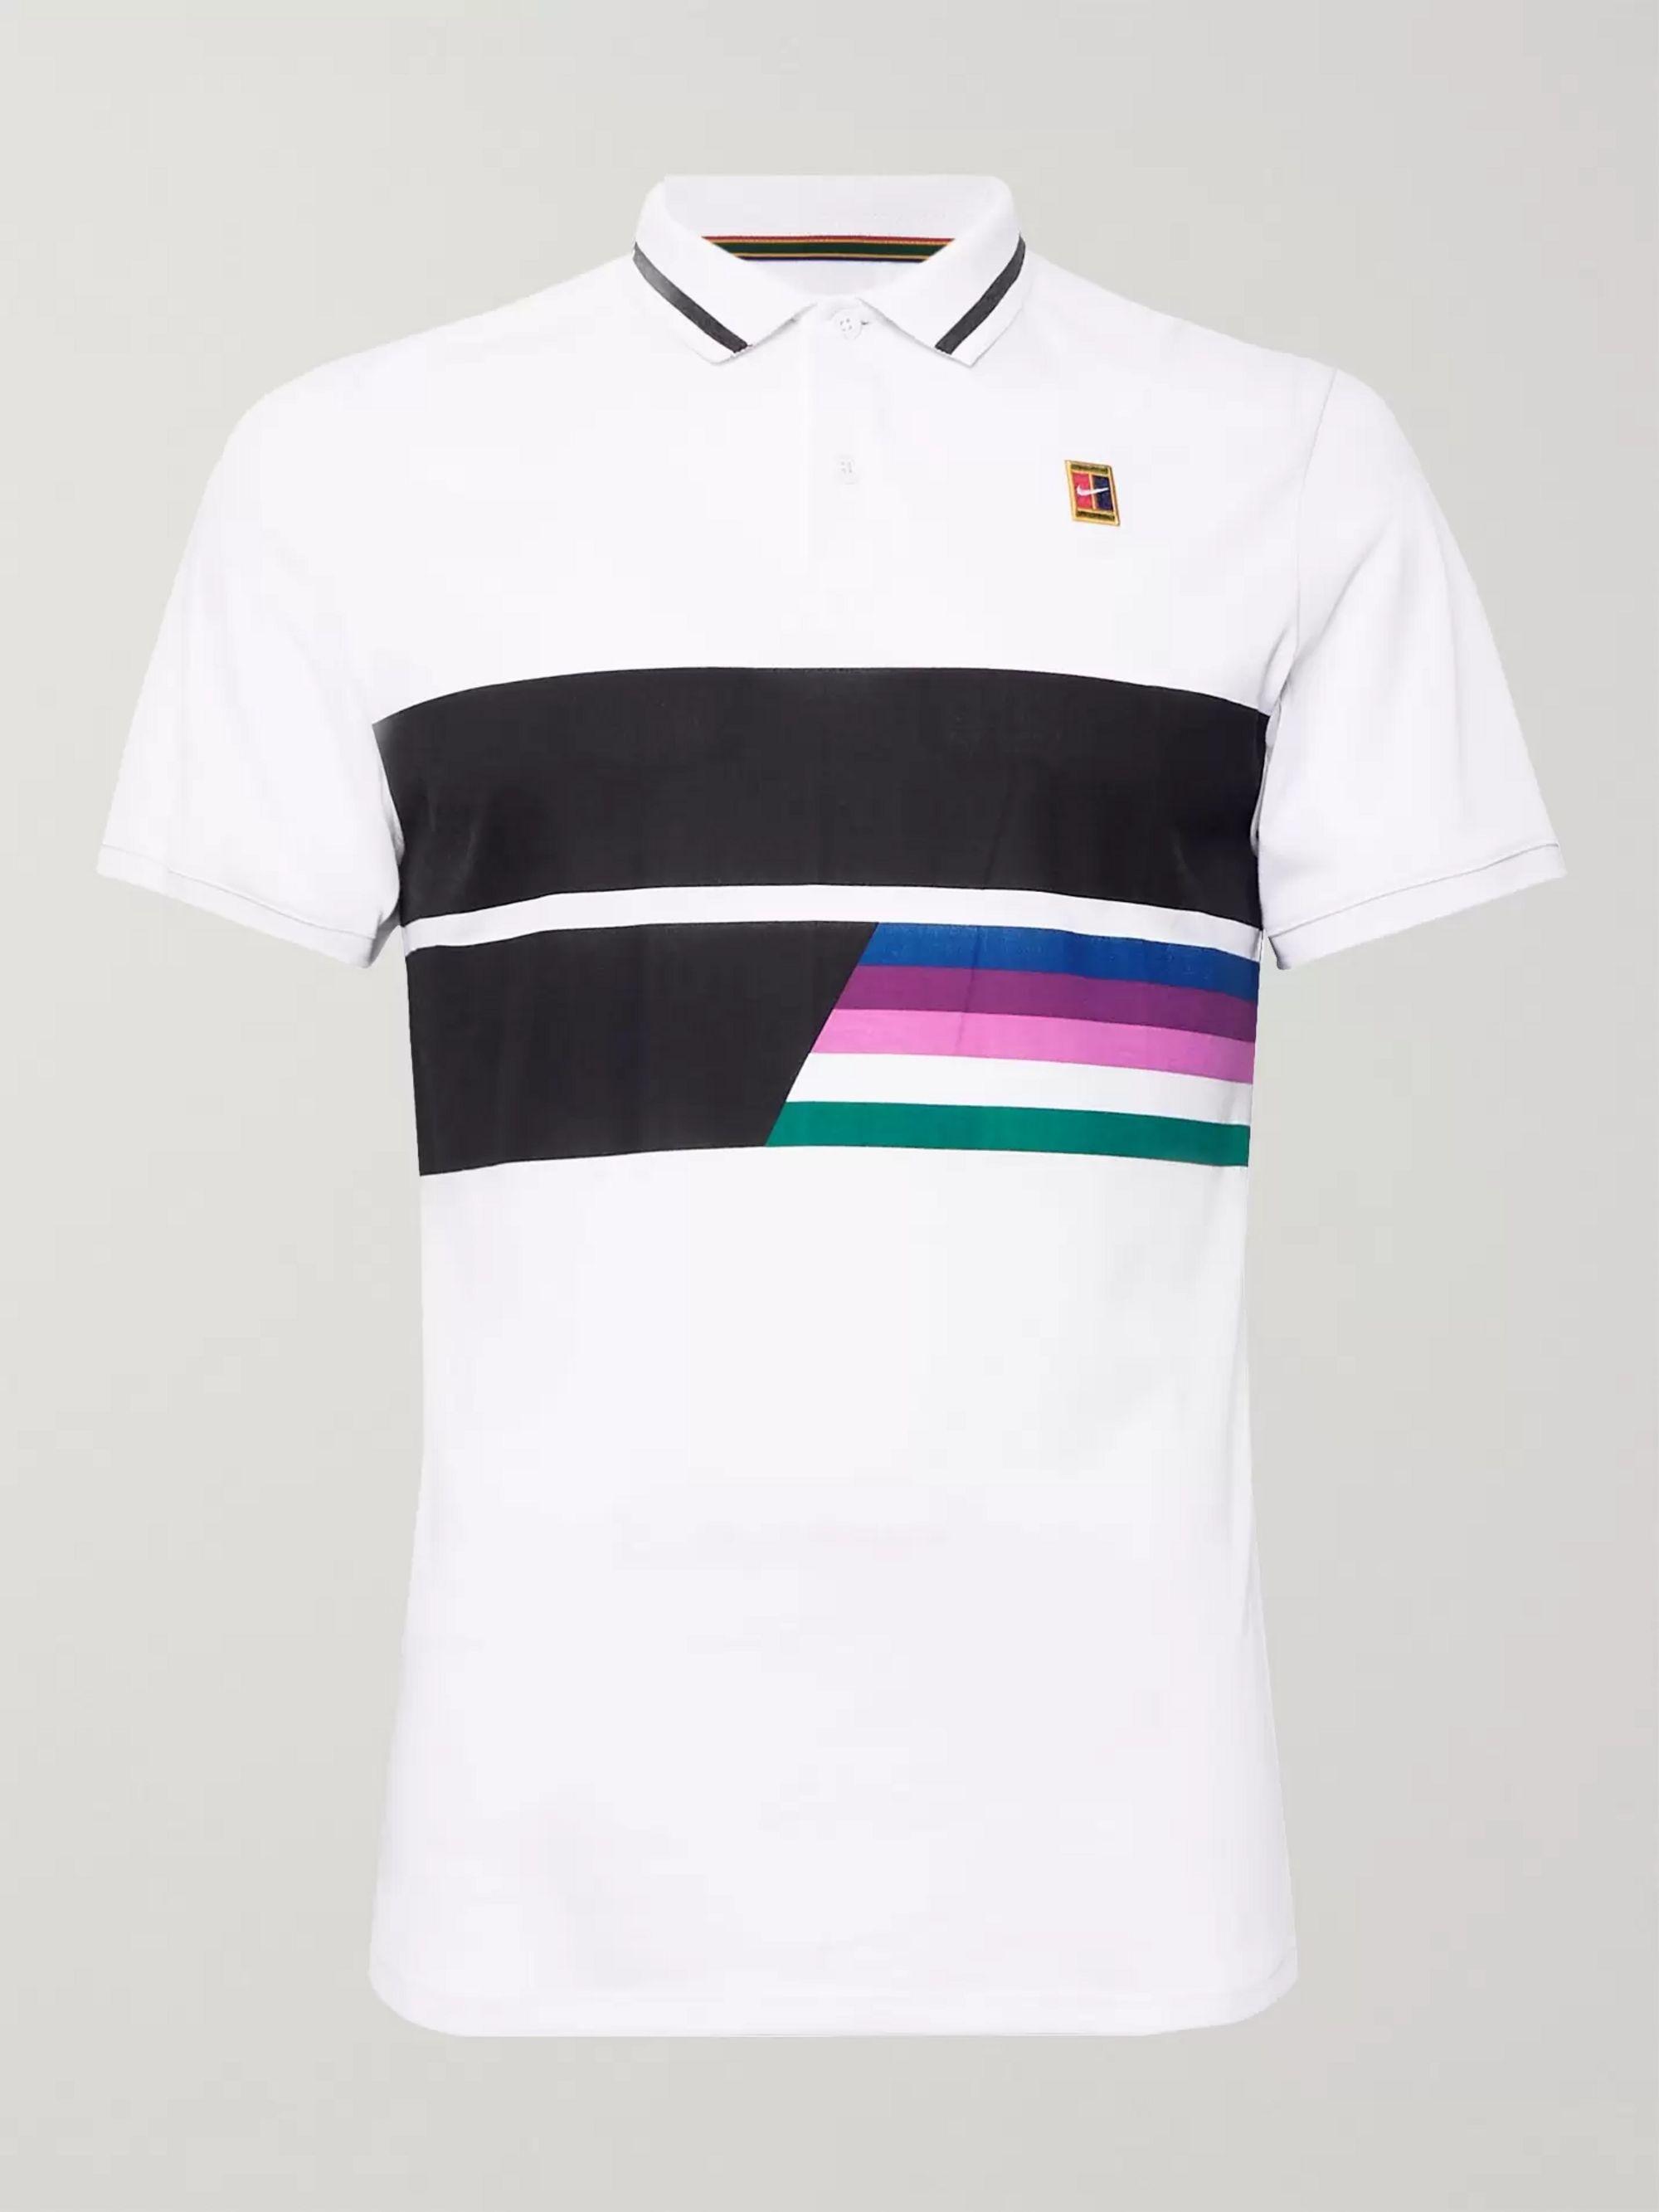 NikeCourt Advantage Printed Dri-FIT Tennis Polo Shirt